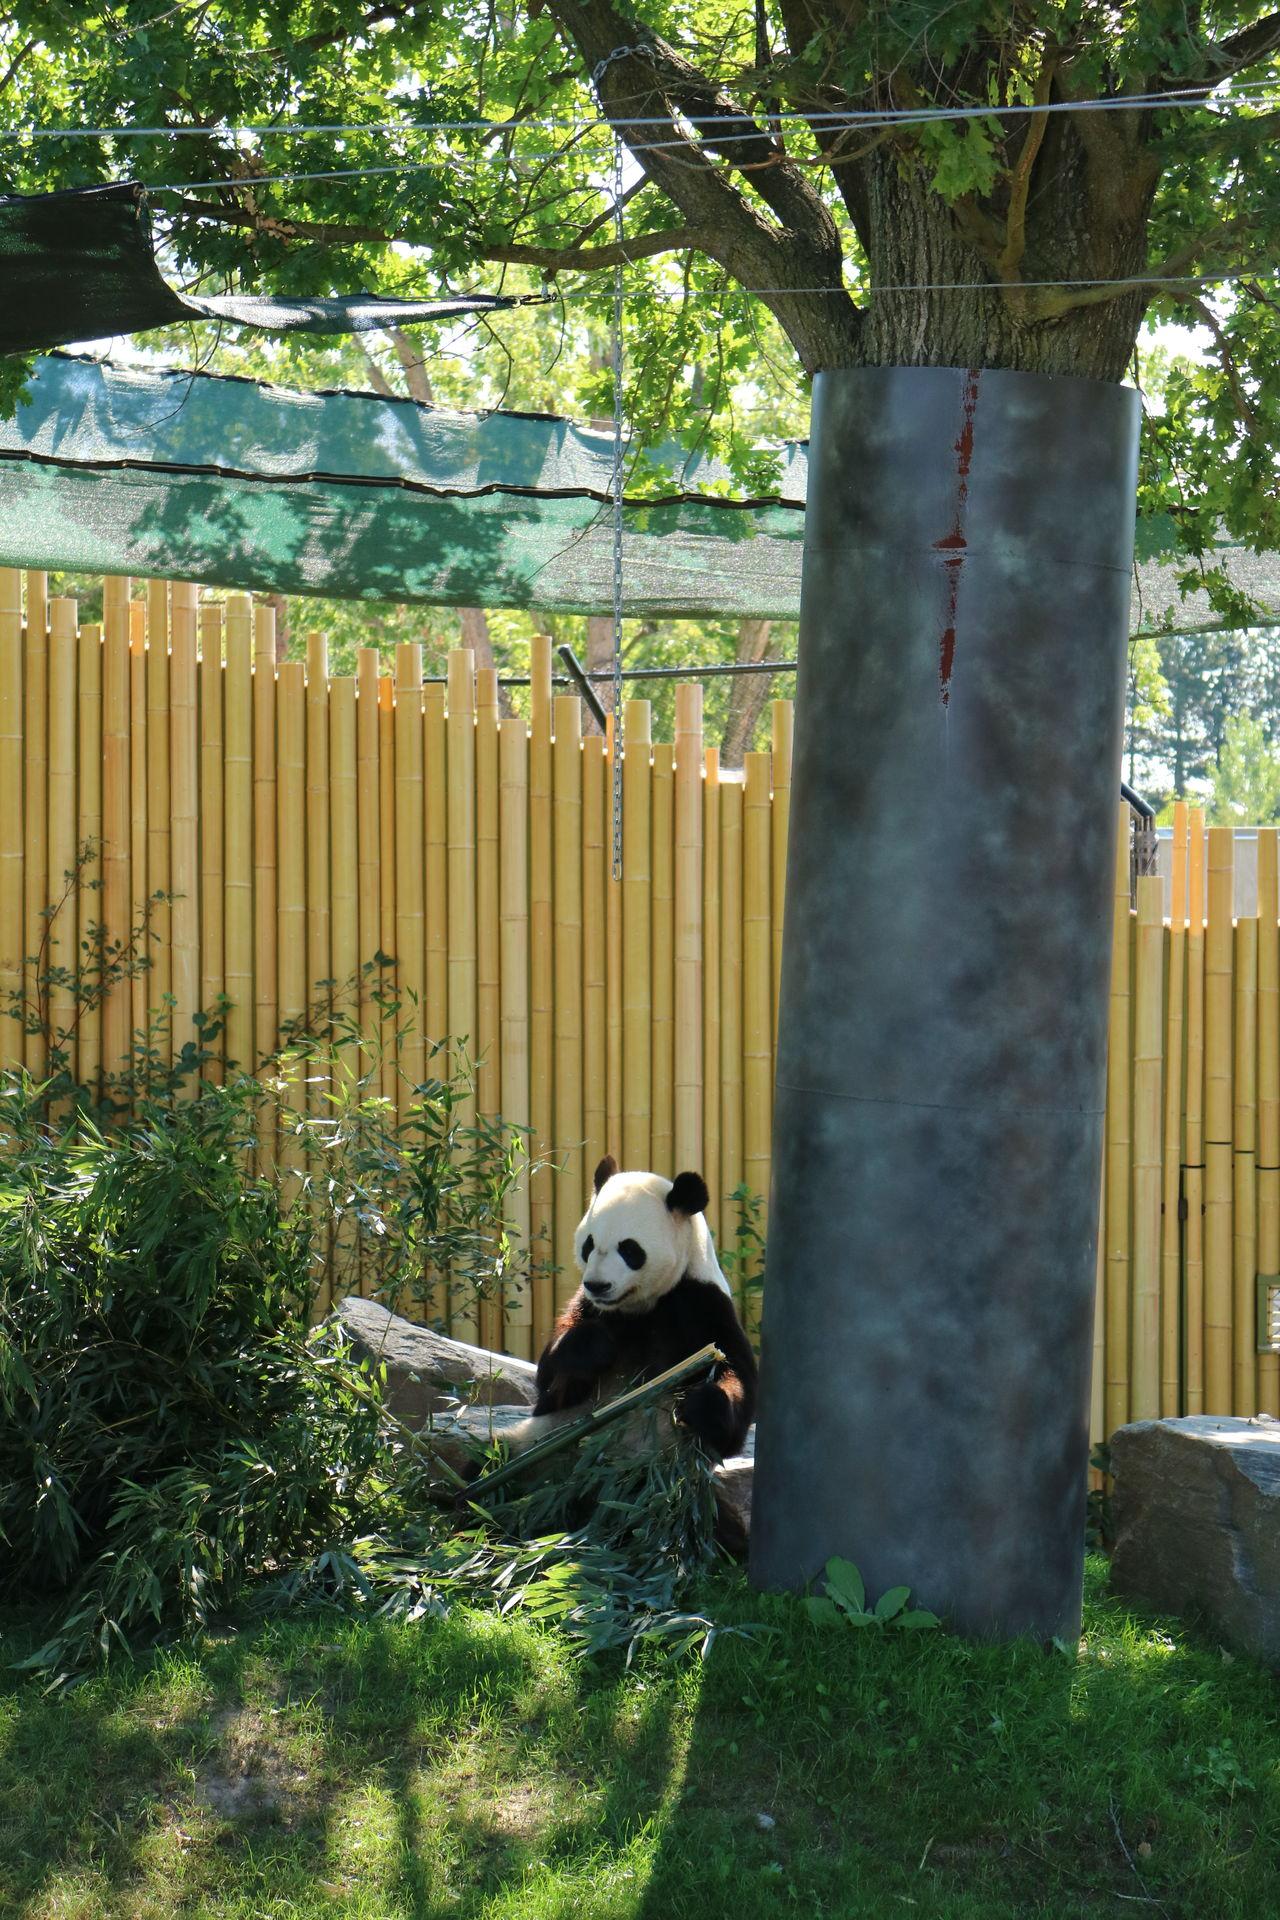 Animal Themes Bamboo Fence Day Grass Green Color Mammal Nature No People One Animal Outdoors Panda Bear Toronto Zoo Tree